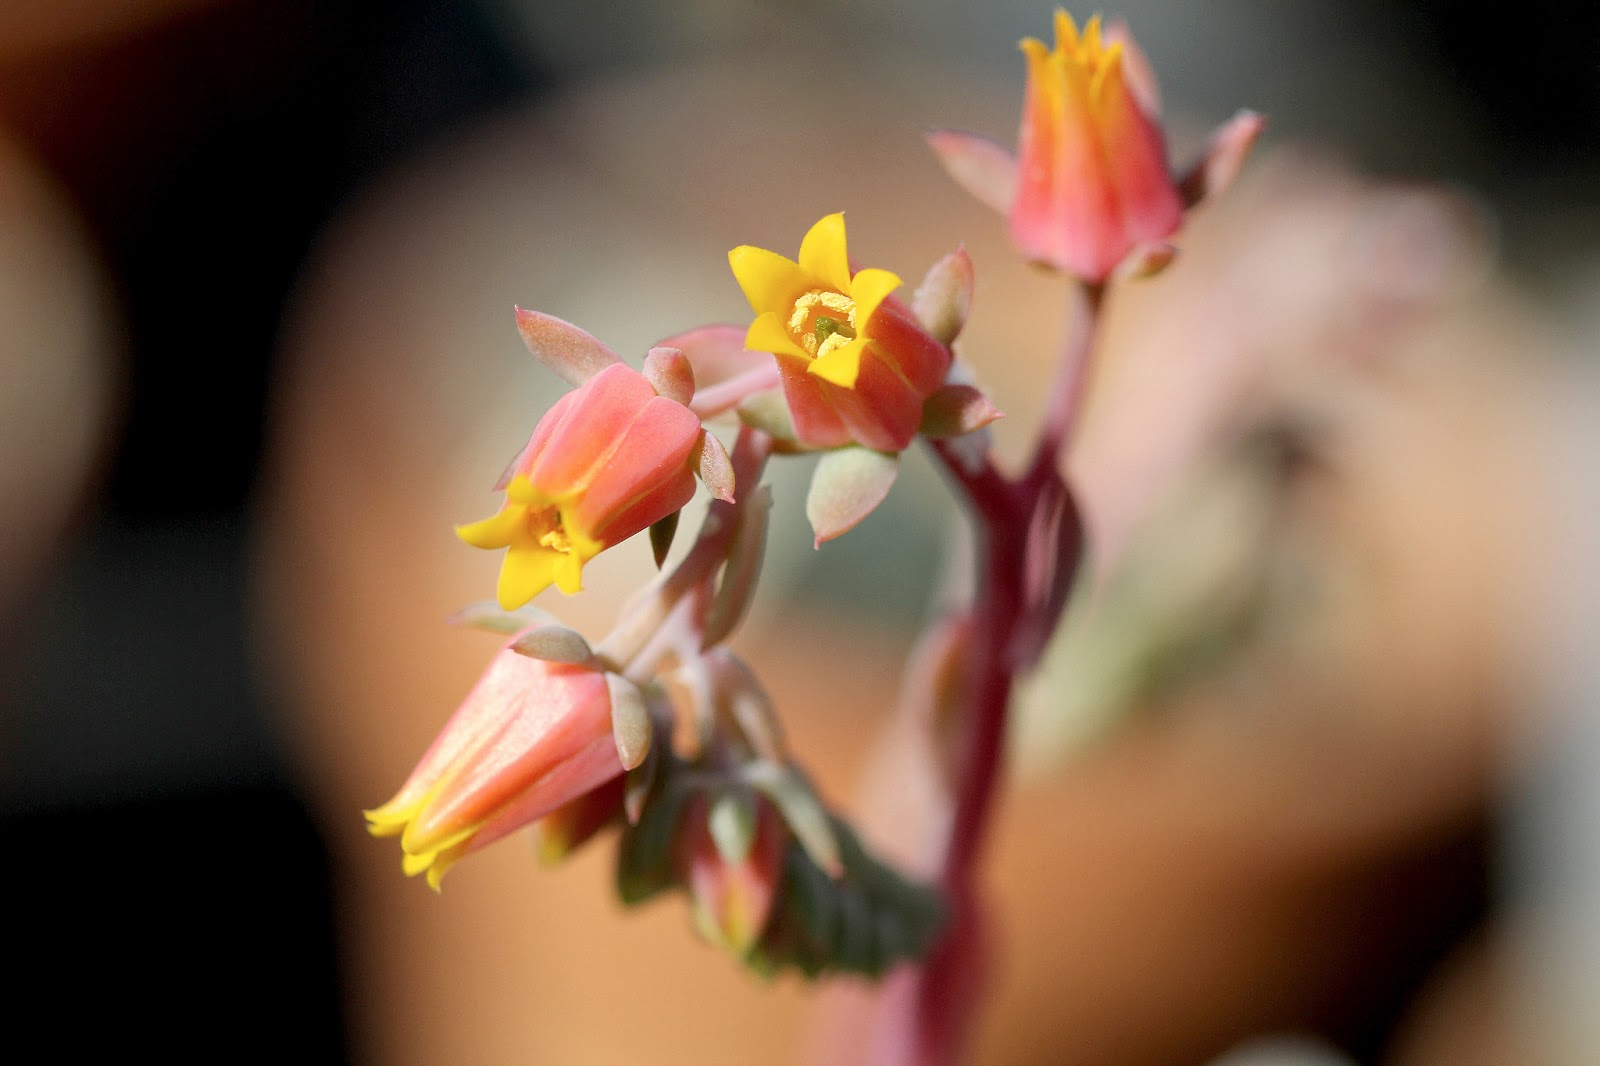 Echeveria aff. cuspidata - Flowers